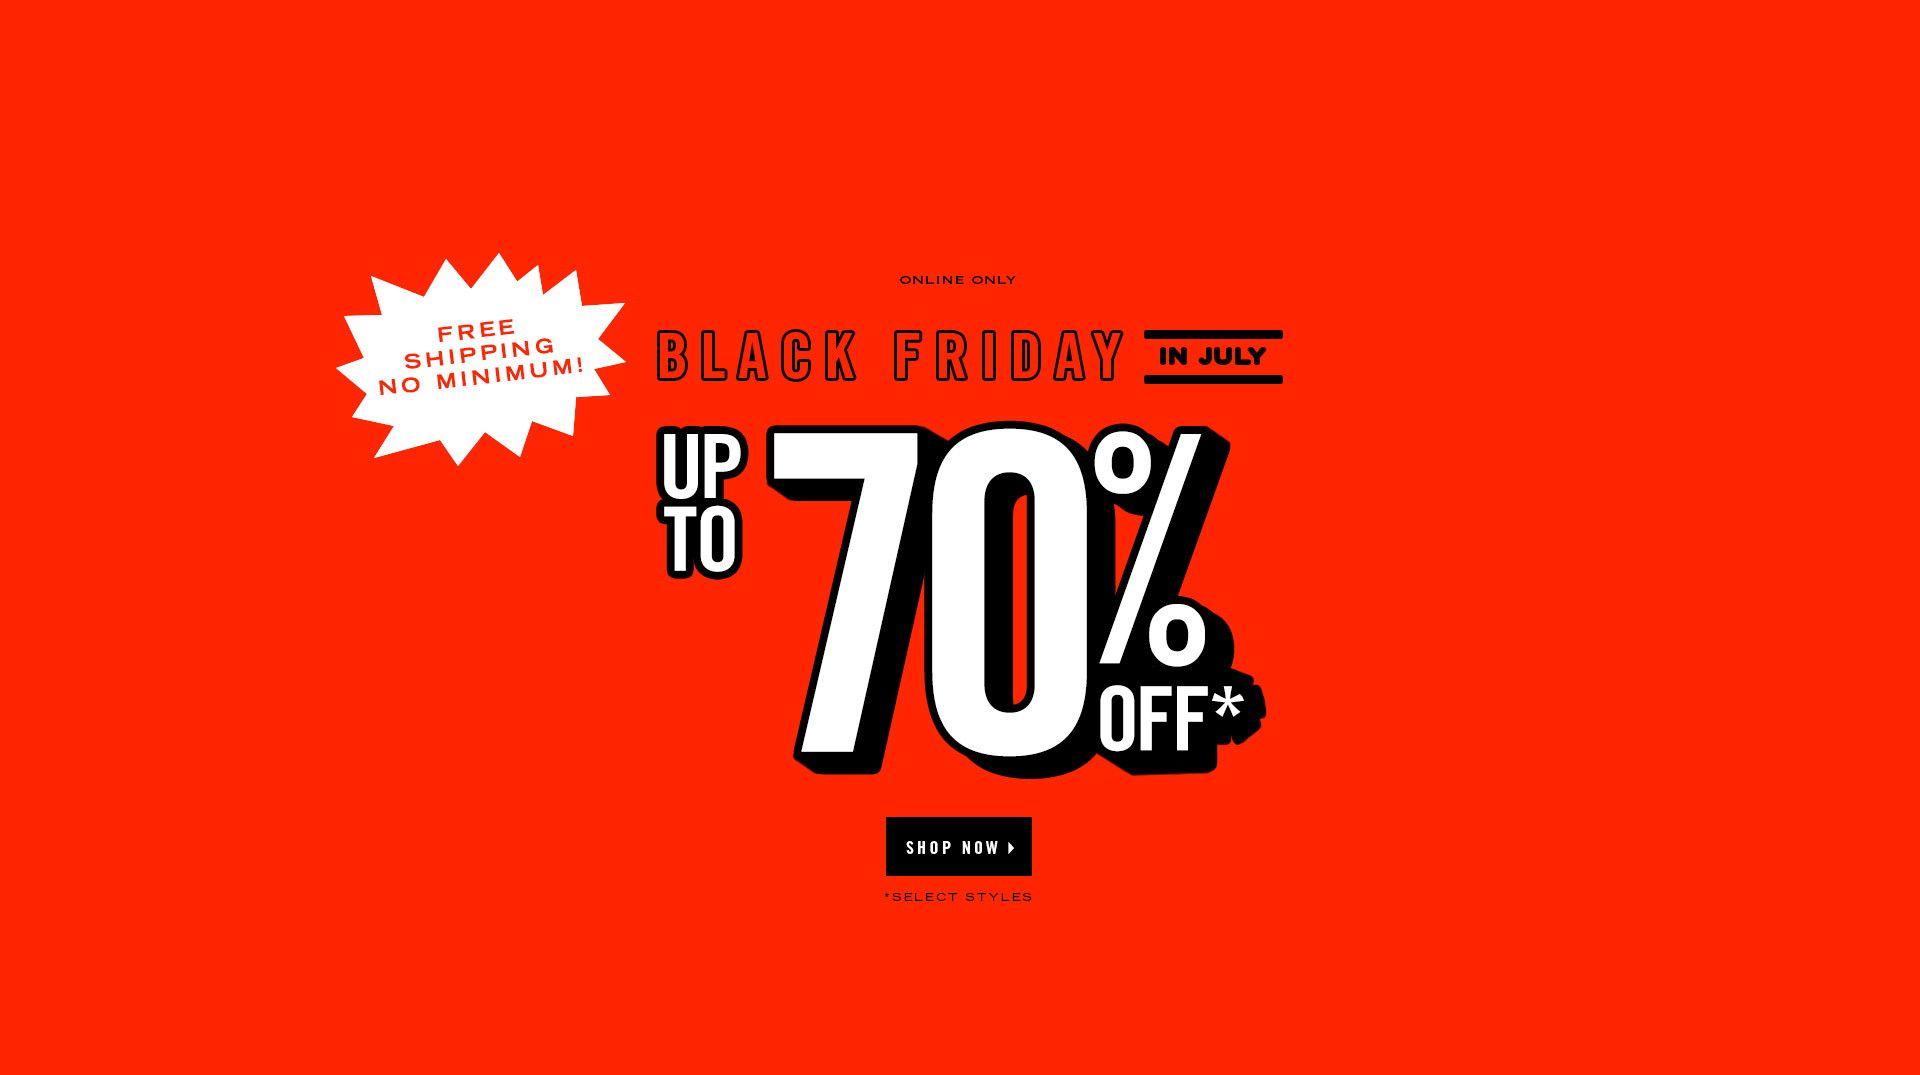 Forever 21 Shop Forever Latest Trends Black Friday In July